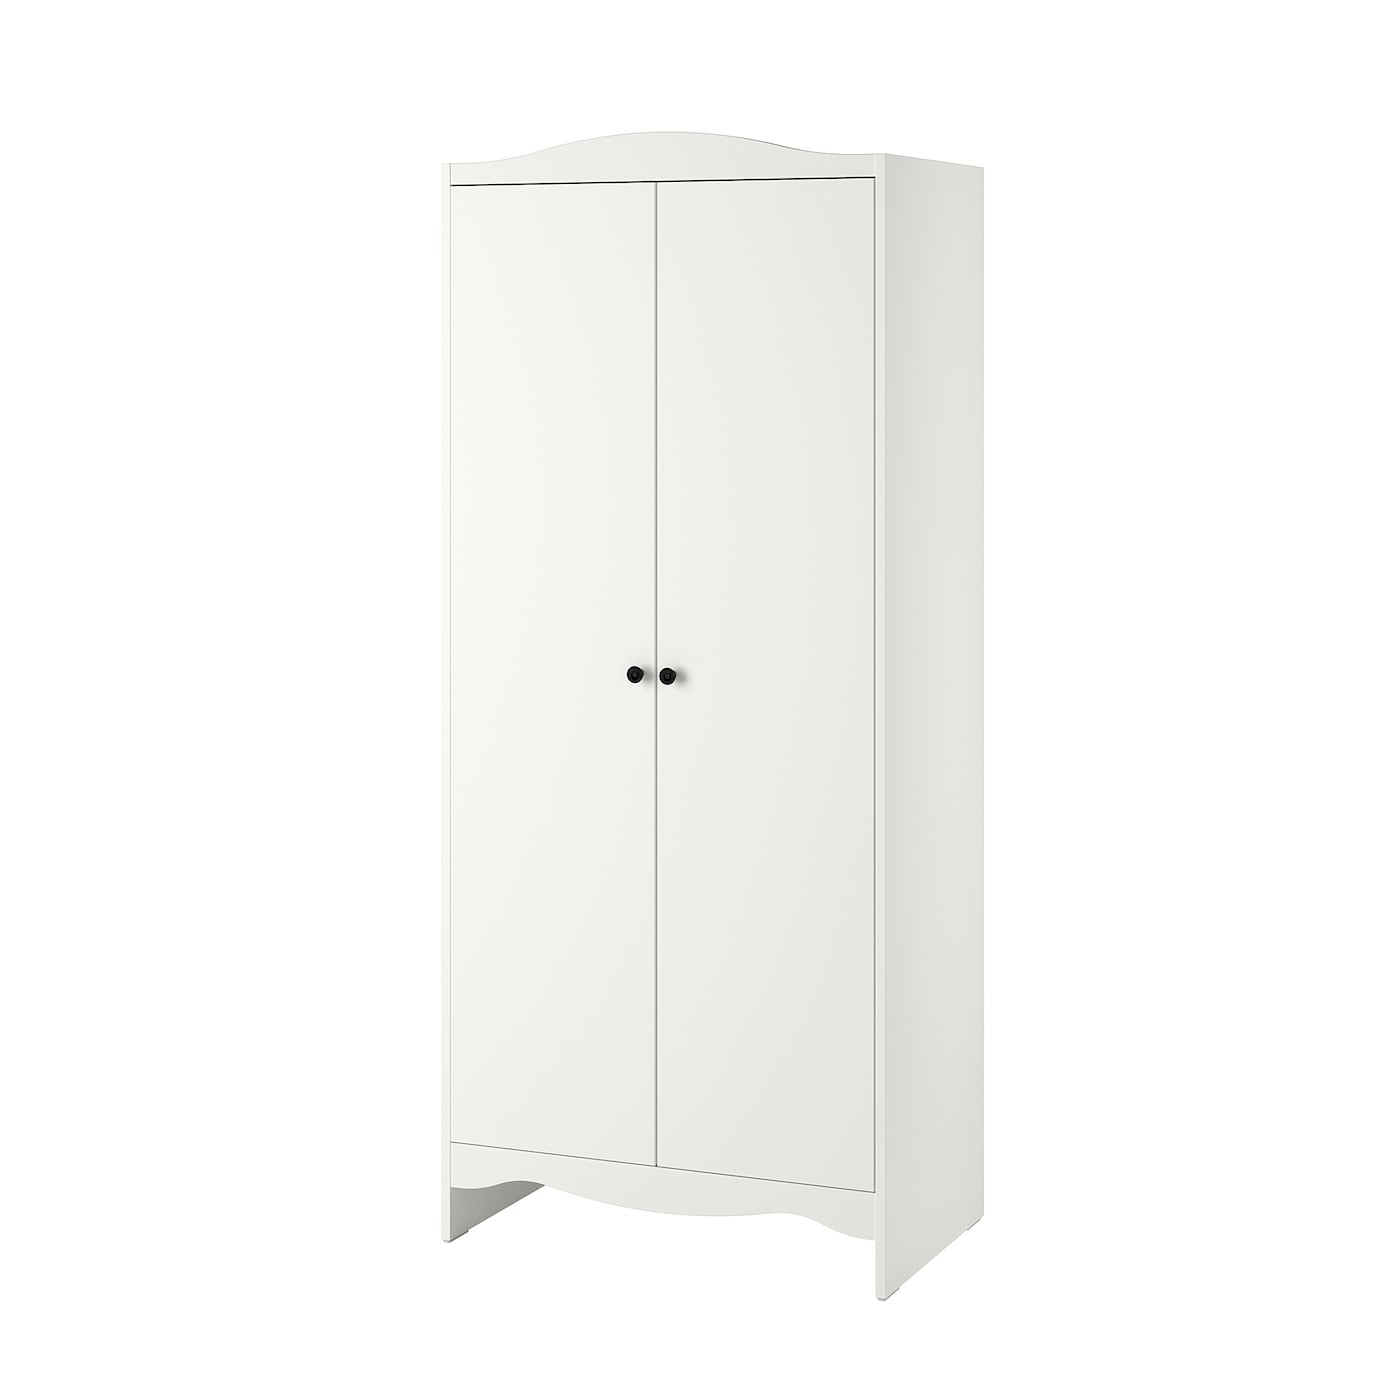 SMÅGÖRA Armoire, blanc, 80x50x187 cm - IKEA